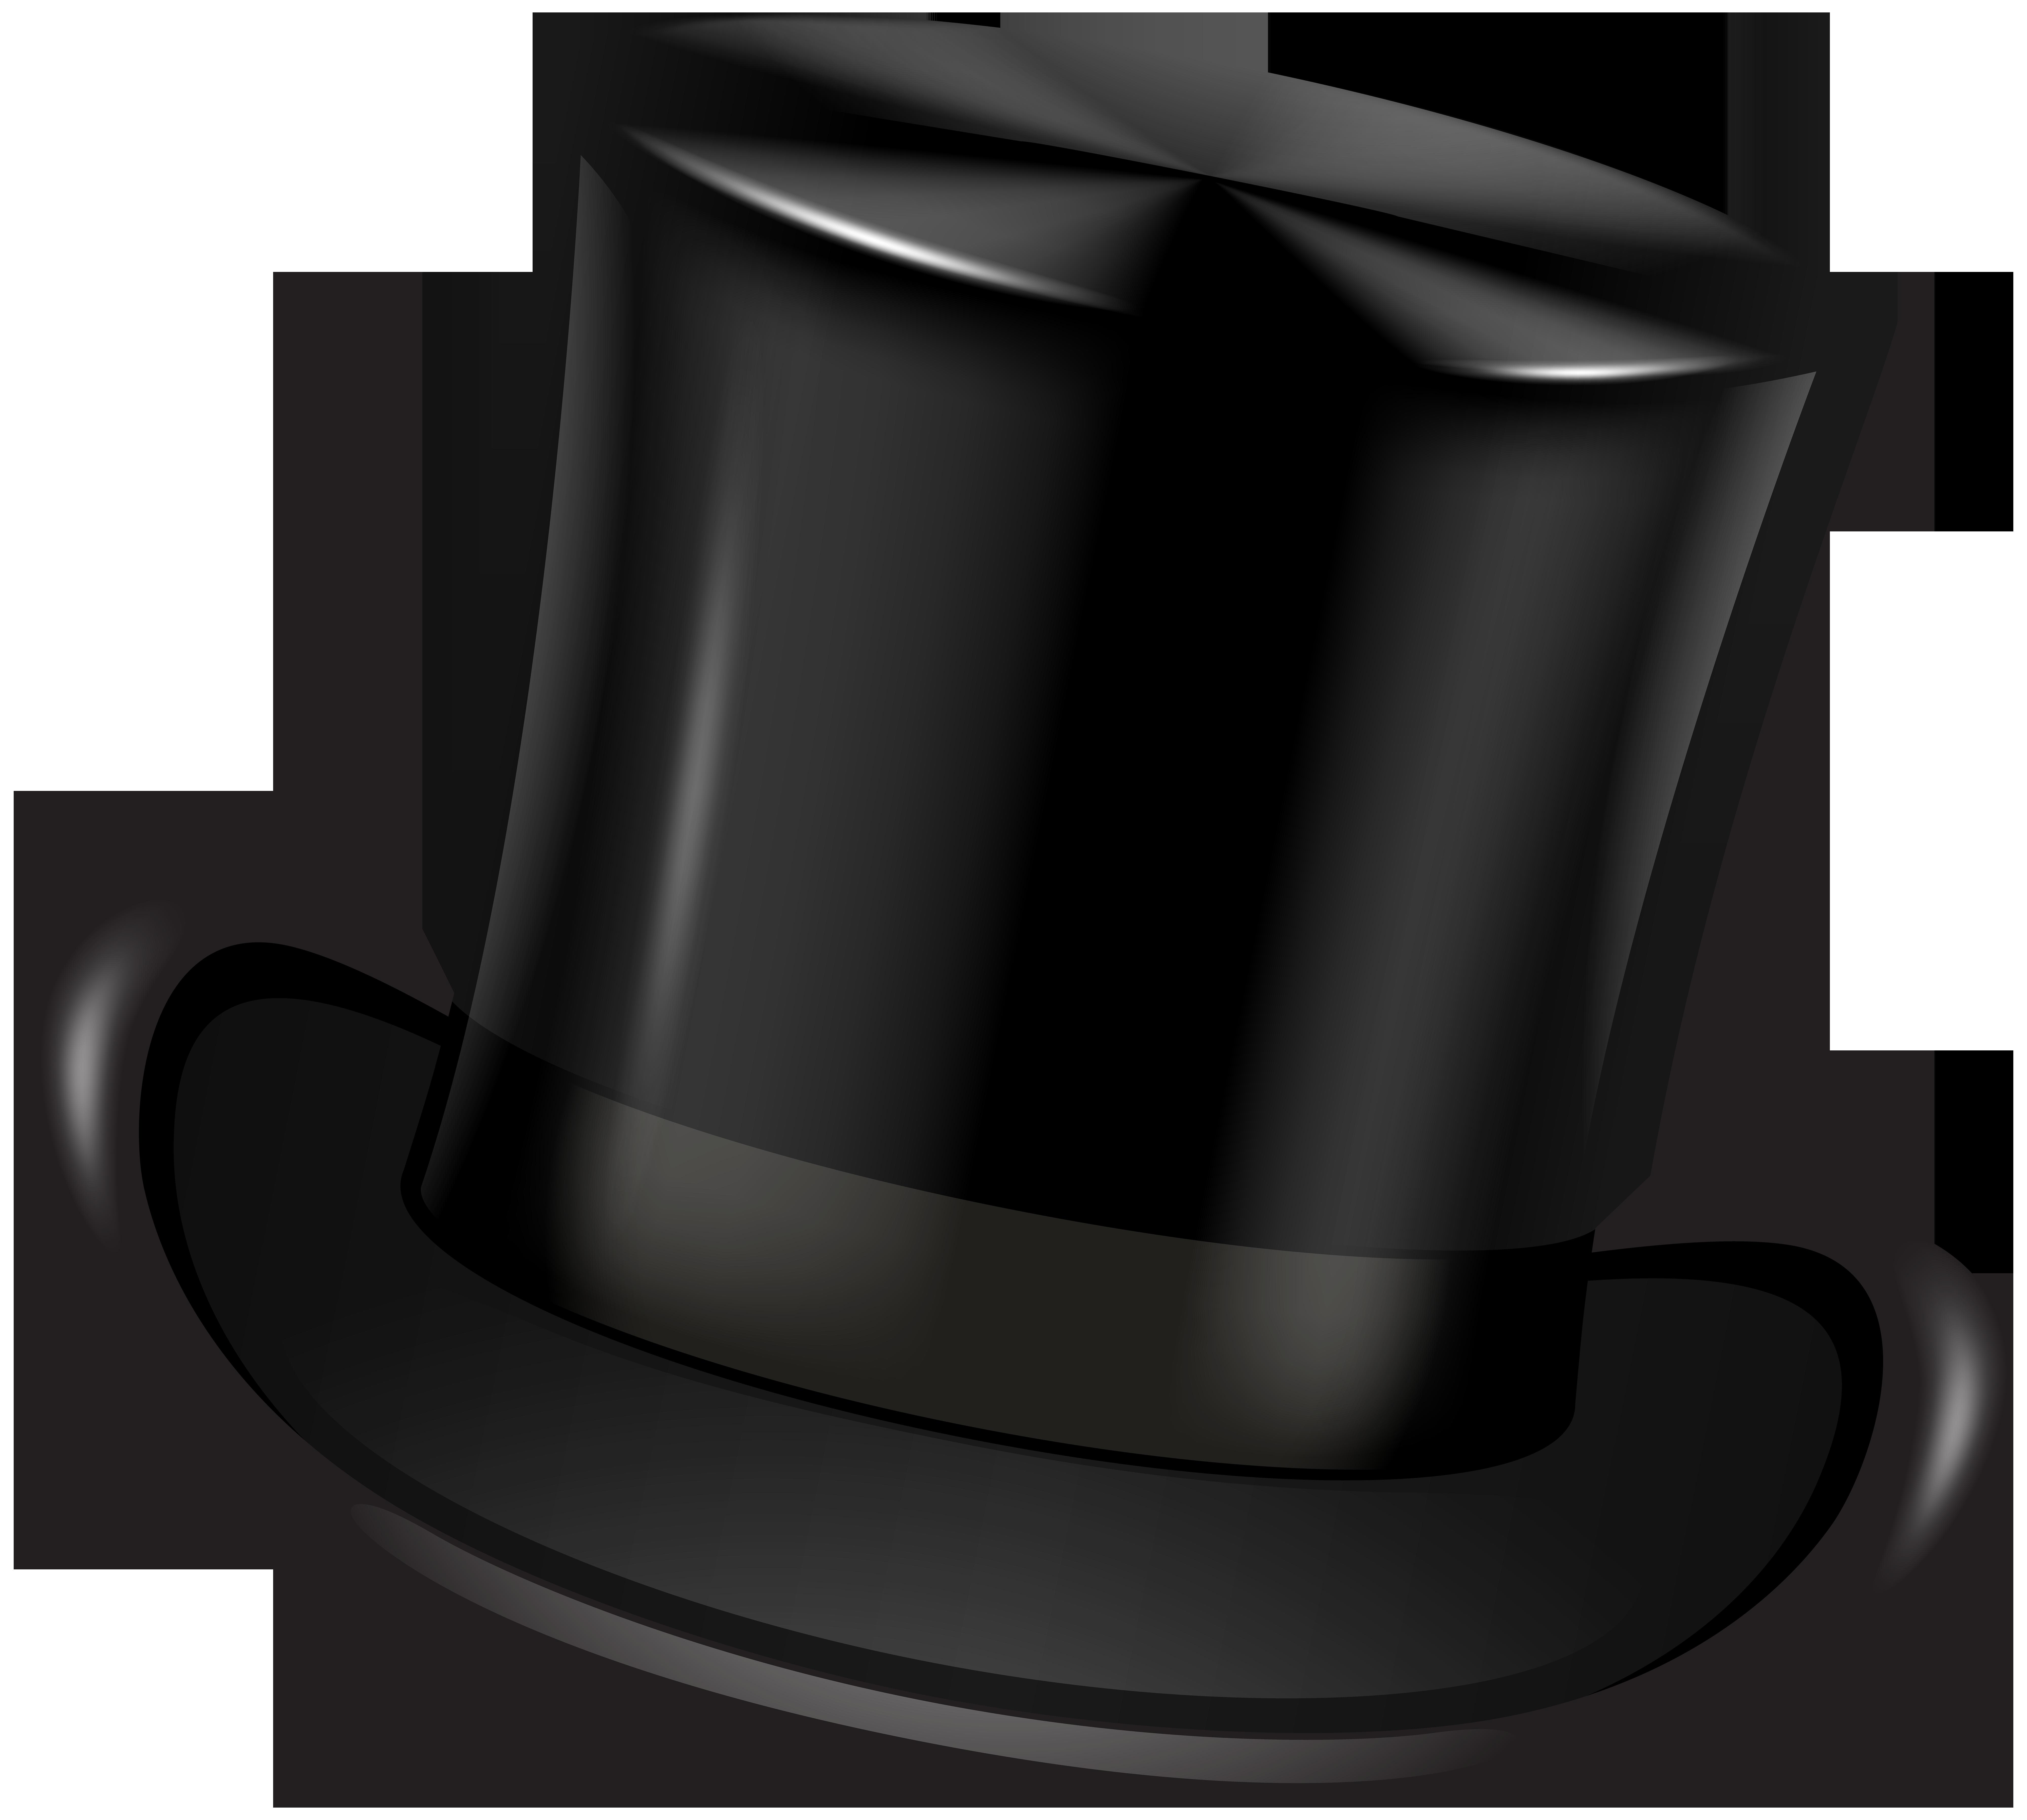 Black Top Hat Transparent Clip Art PNG Image.